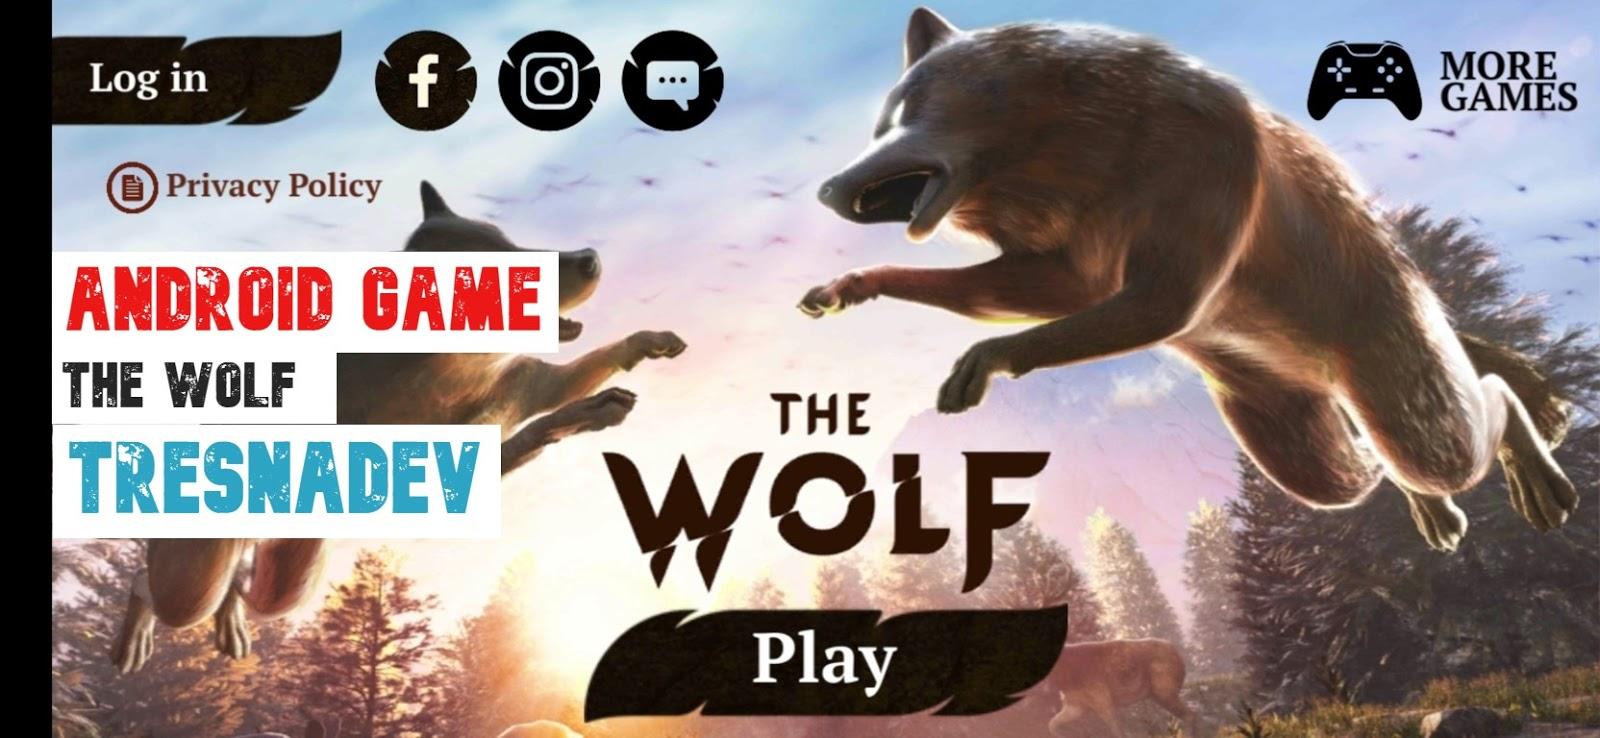 The Wolf Apk 1.9.0